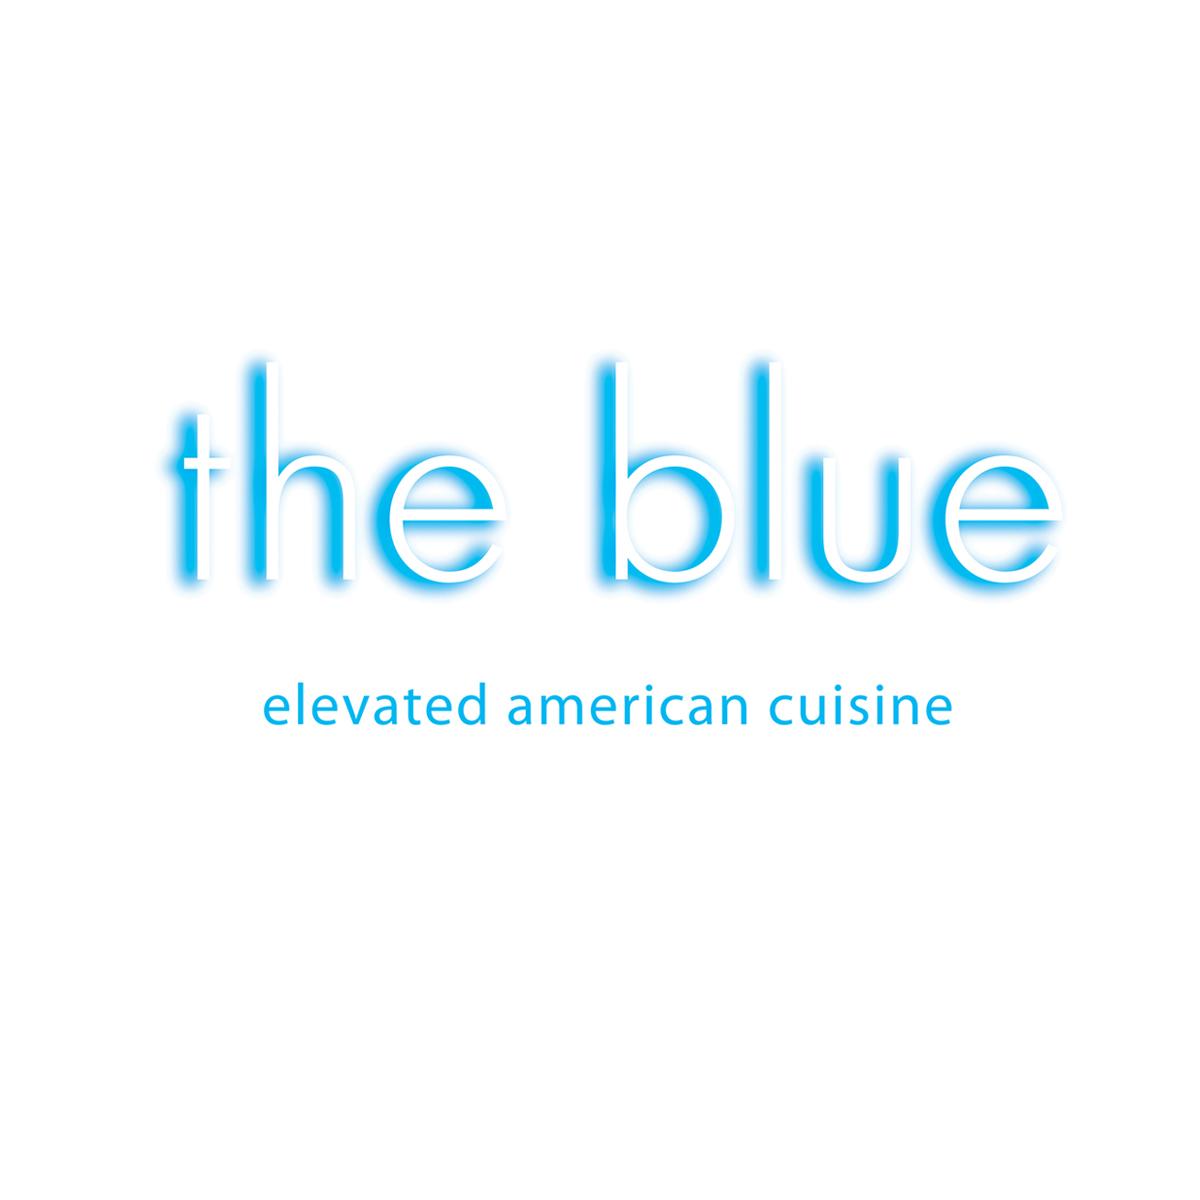 theblue_logo.jpg